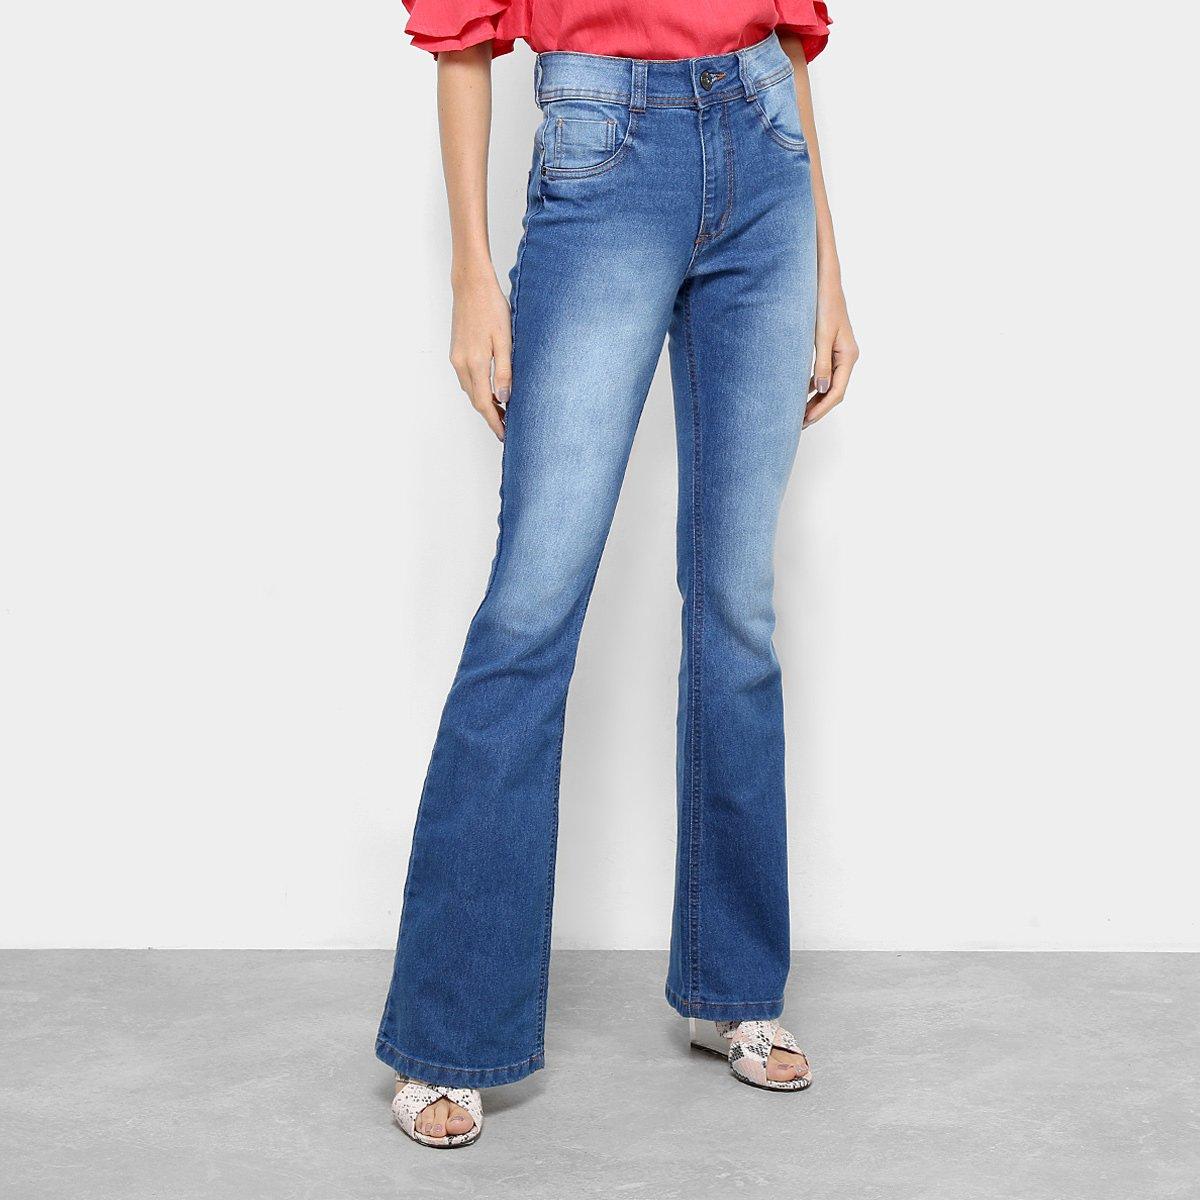 0c919bad2 Calça Jeans Flare Biotipo Estonada Cintura Média Feminina